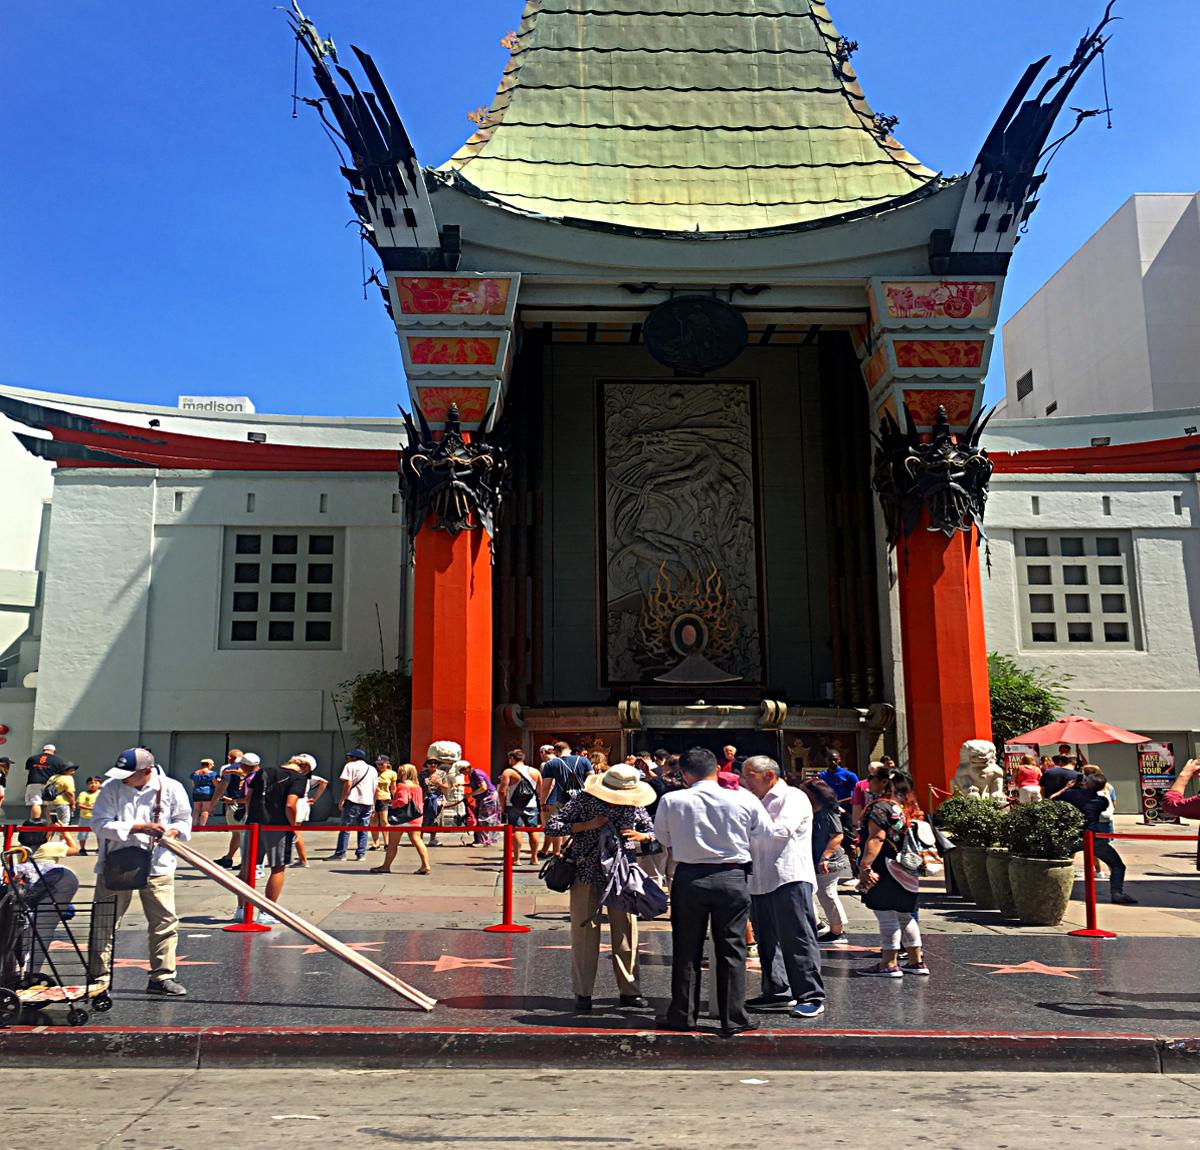 Los Angeles atrakcje-Chinese Theatre